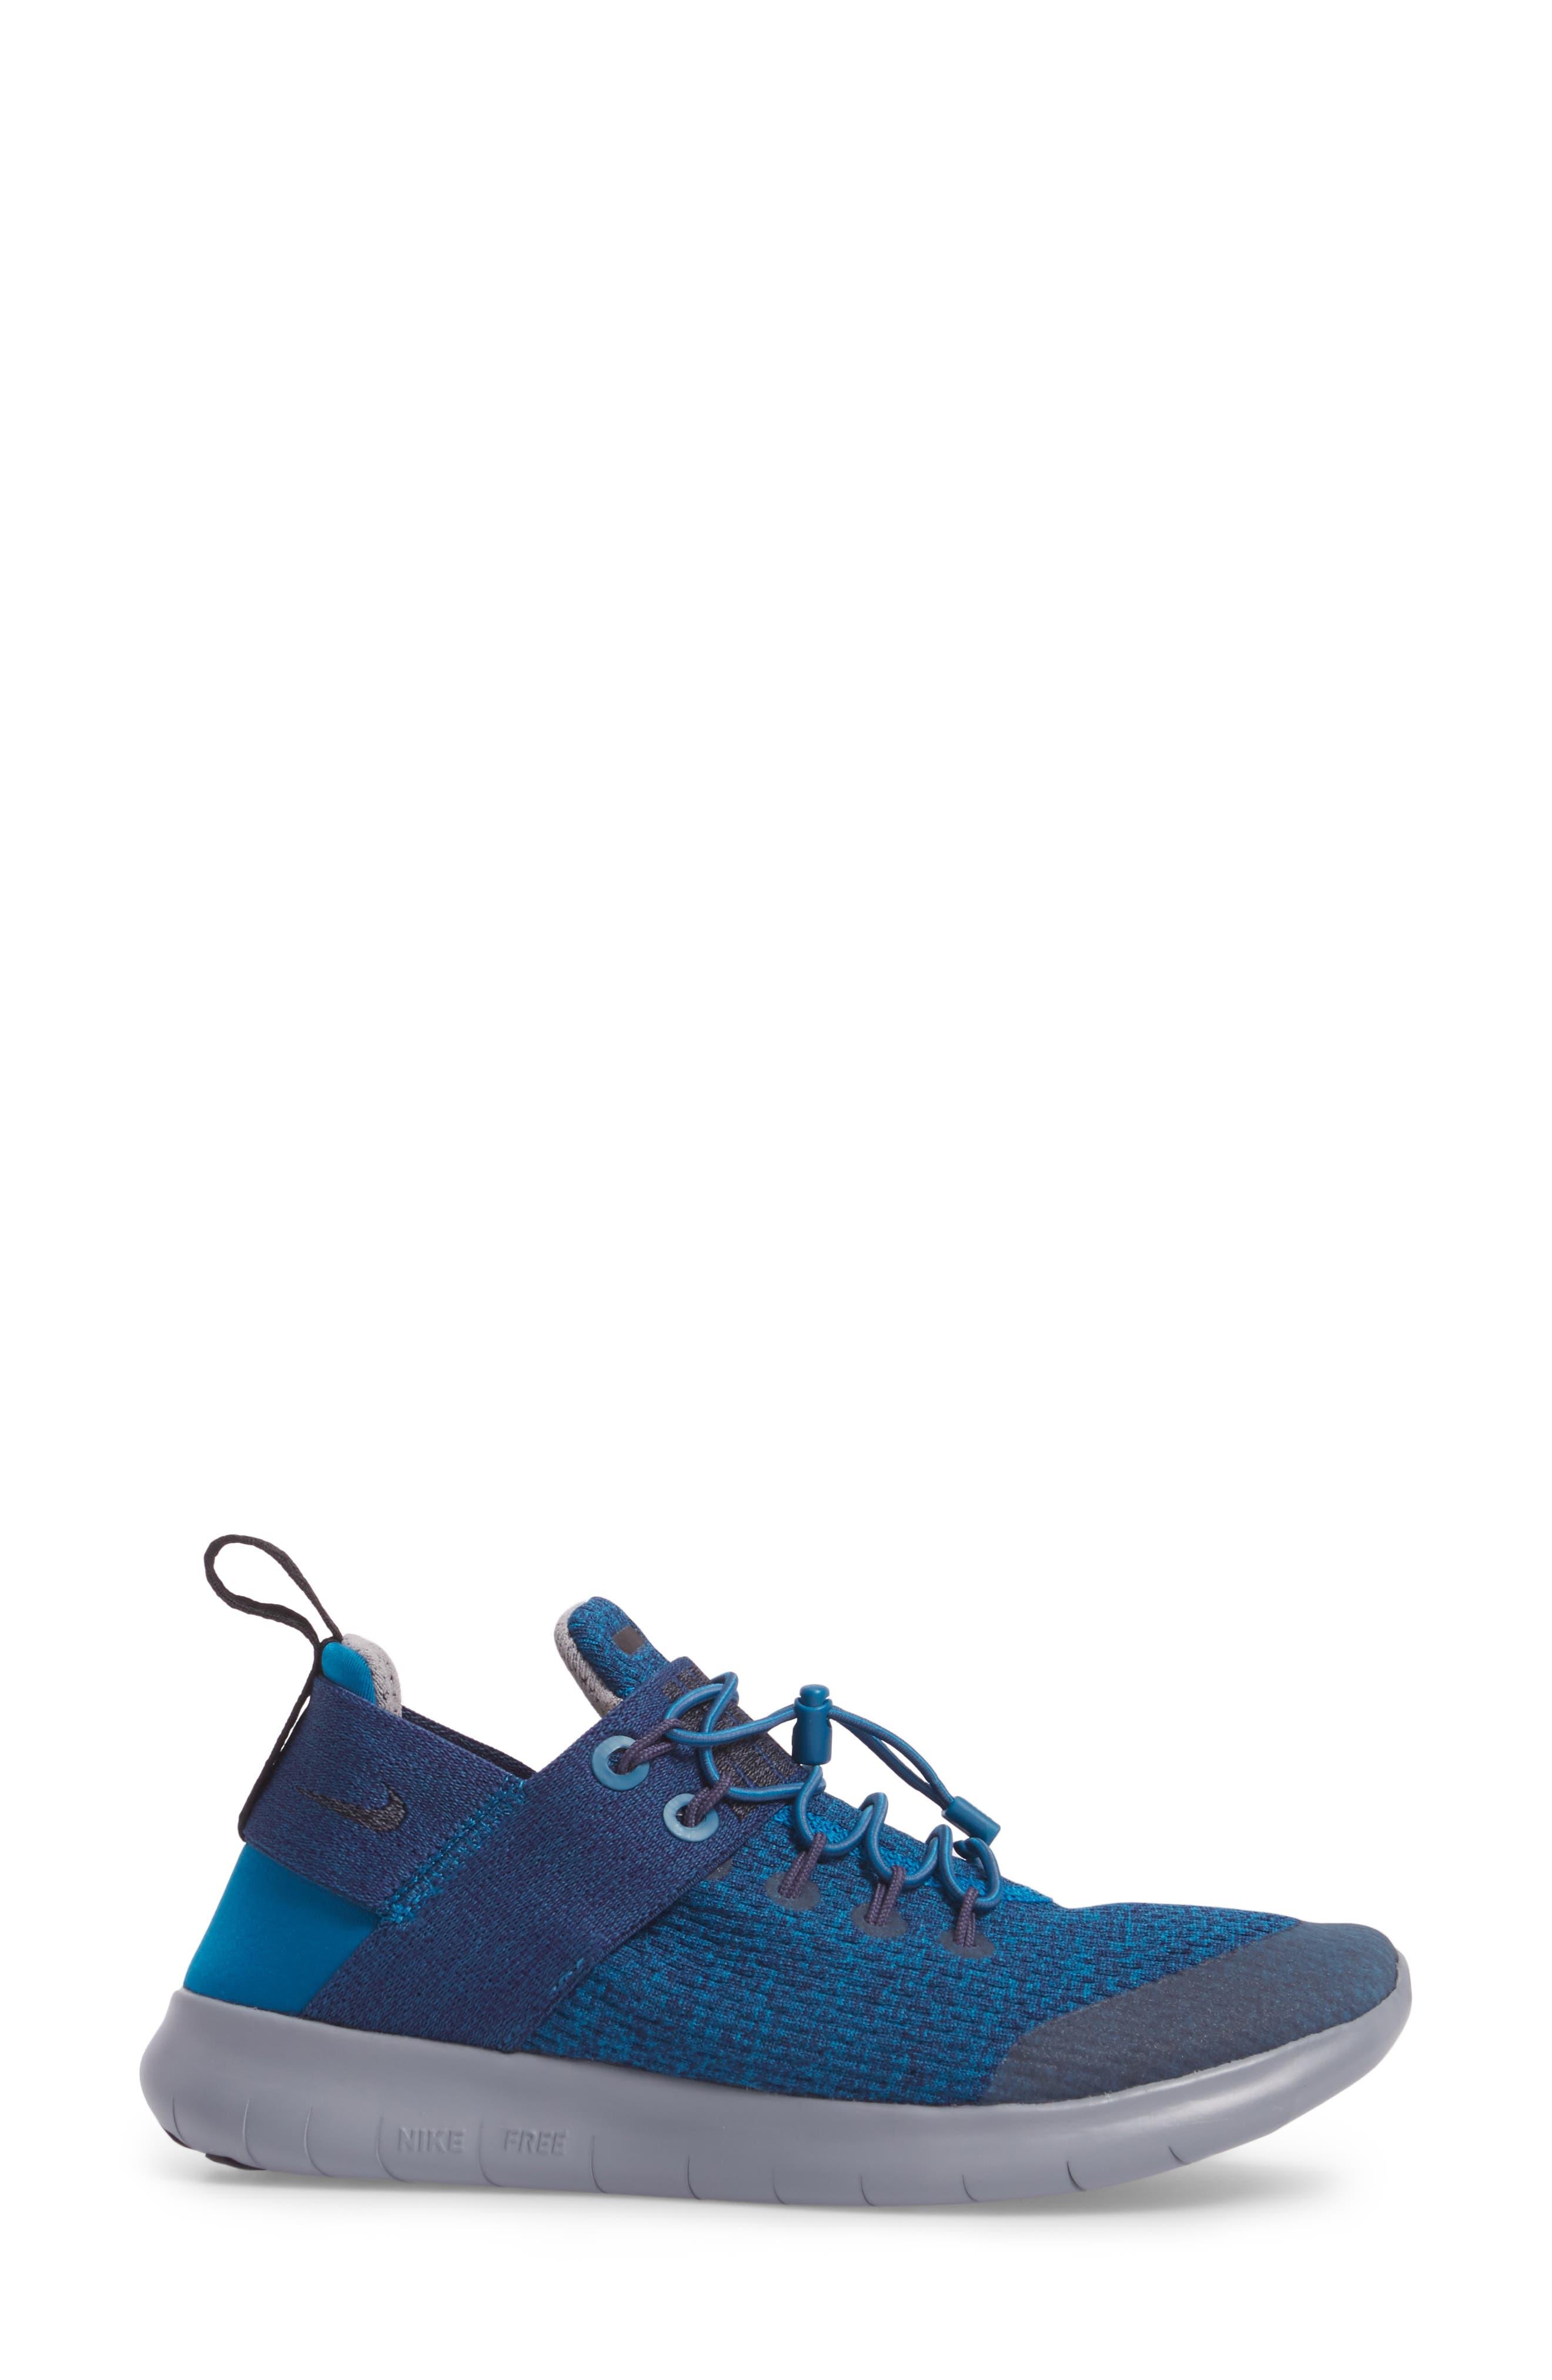 Free RN Commuter 2017 Premium Running Shoe,                             Alternate thumbnail 3, color,                             Green / Black/ Cobblestone